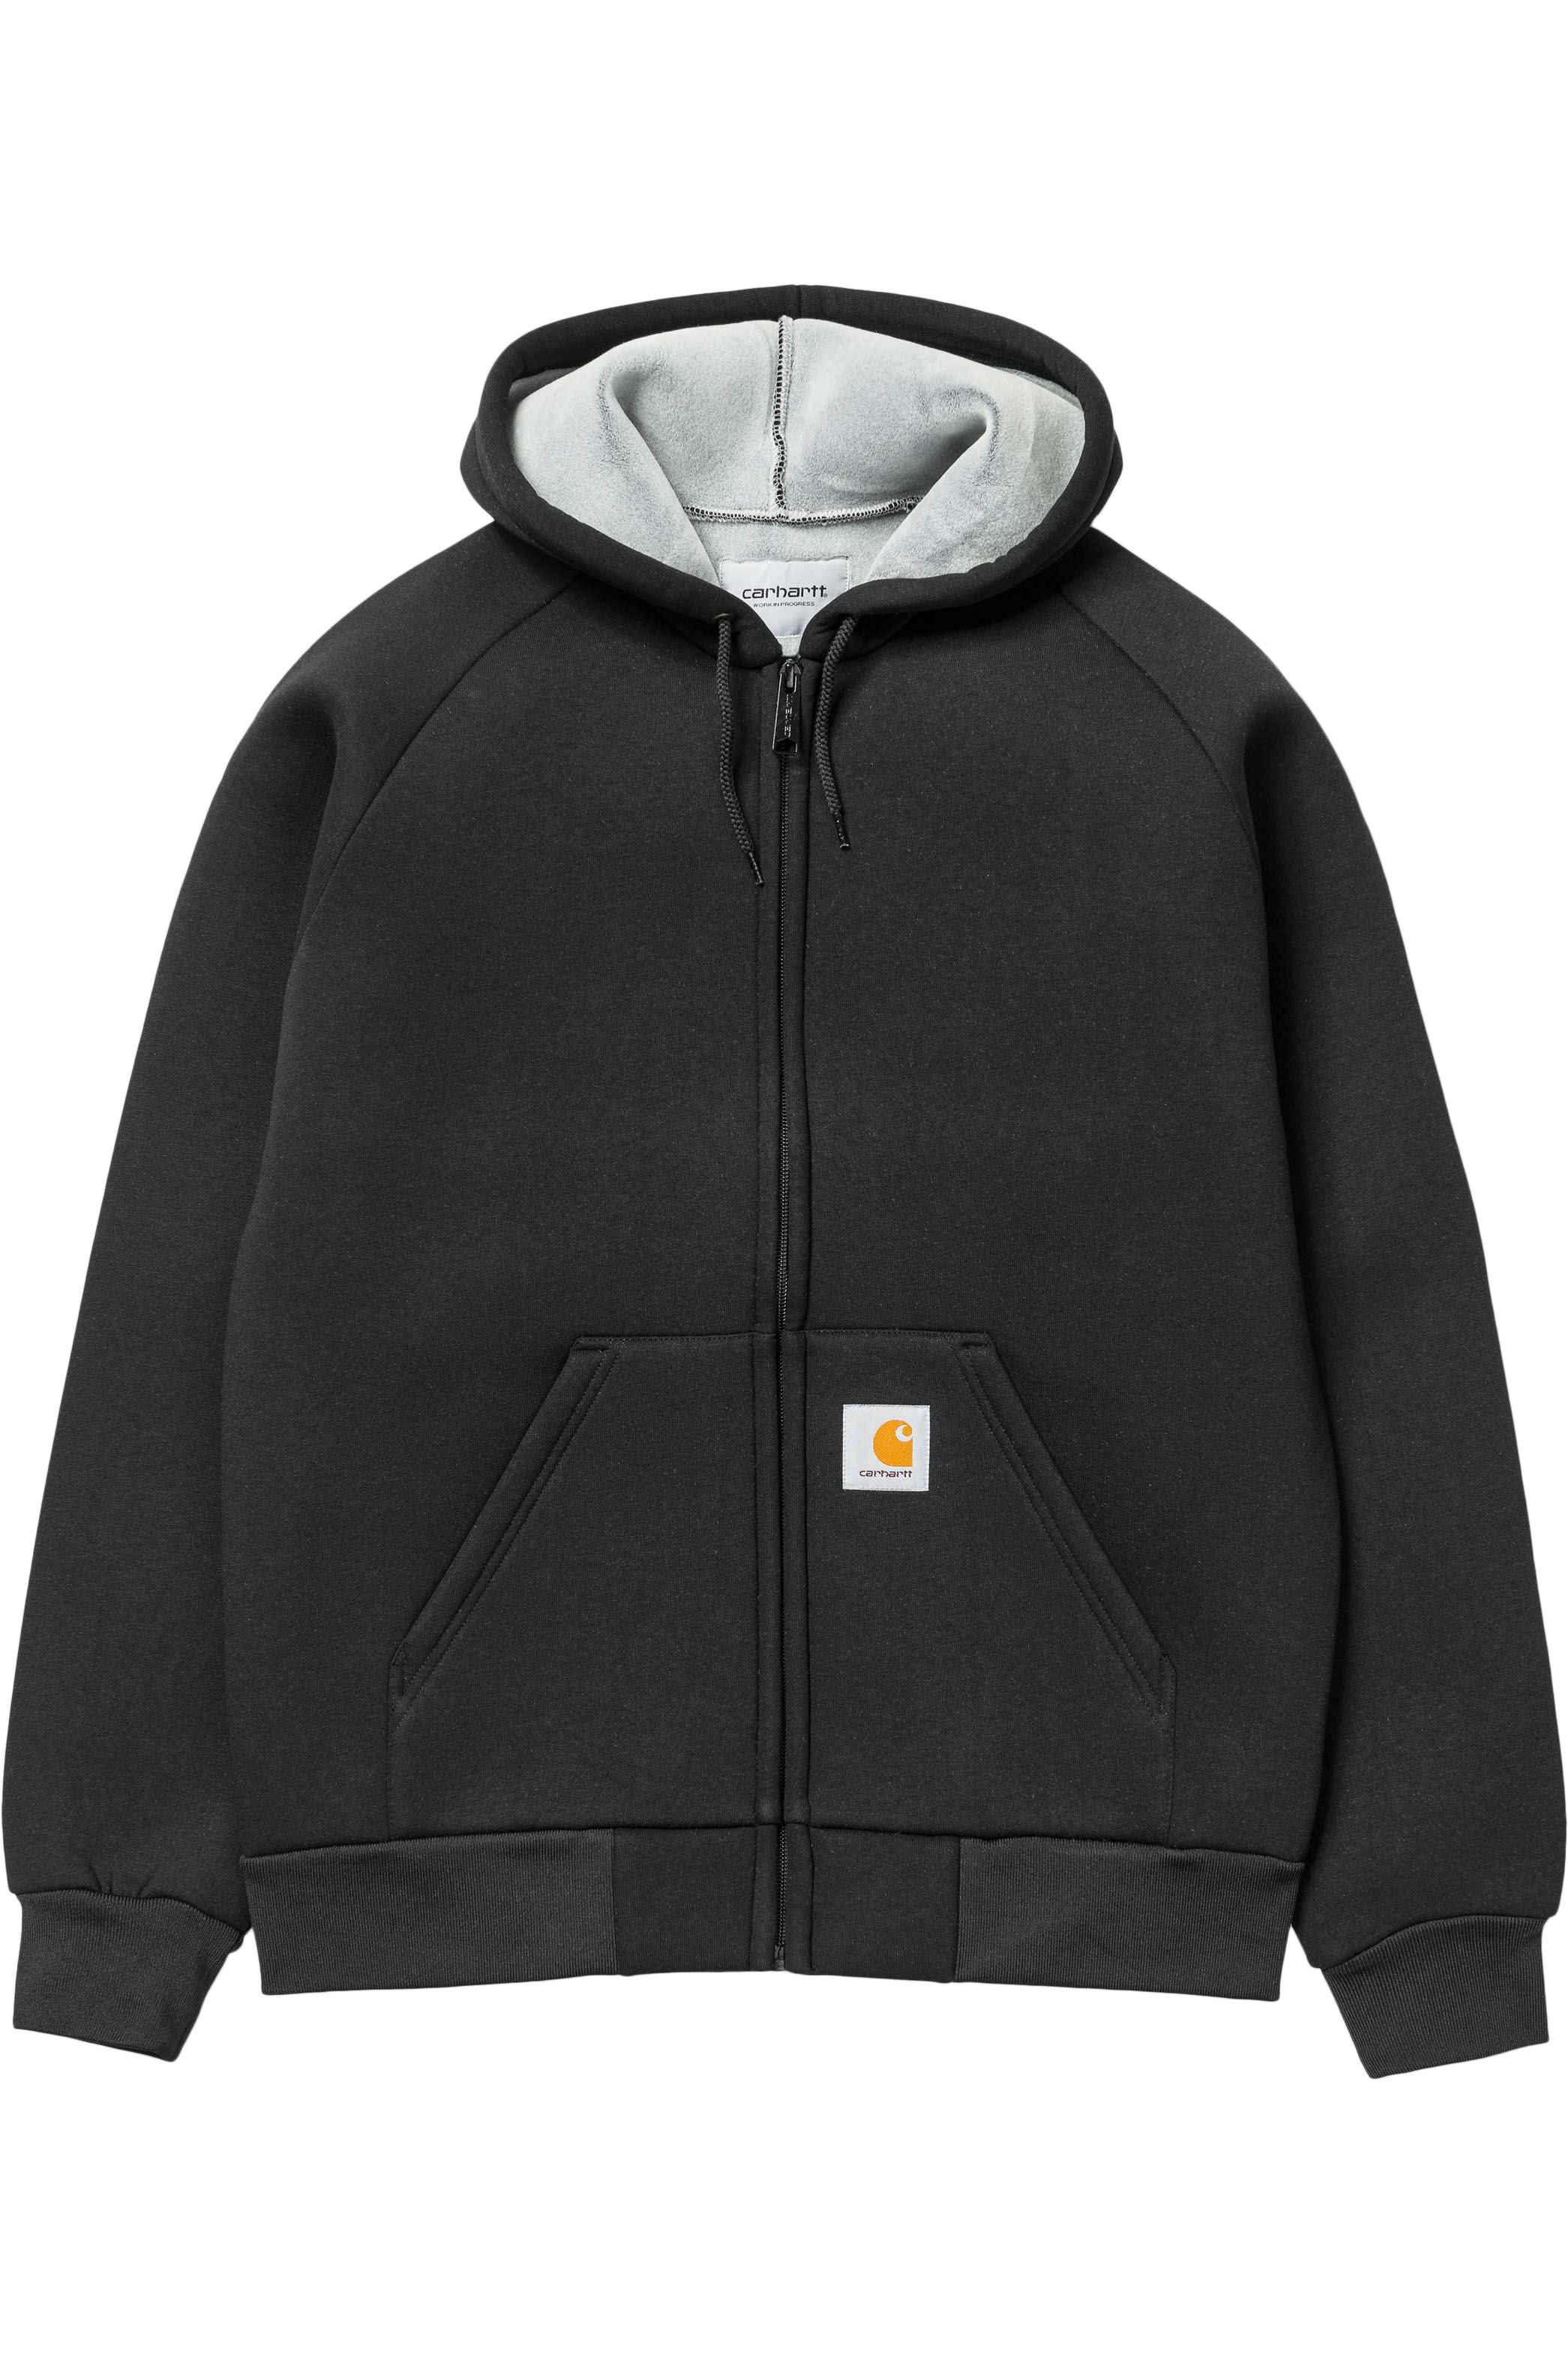 Carhartt WIP Coat CAR-LUX HOODED Black/Grey